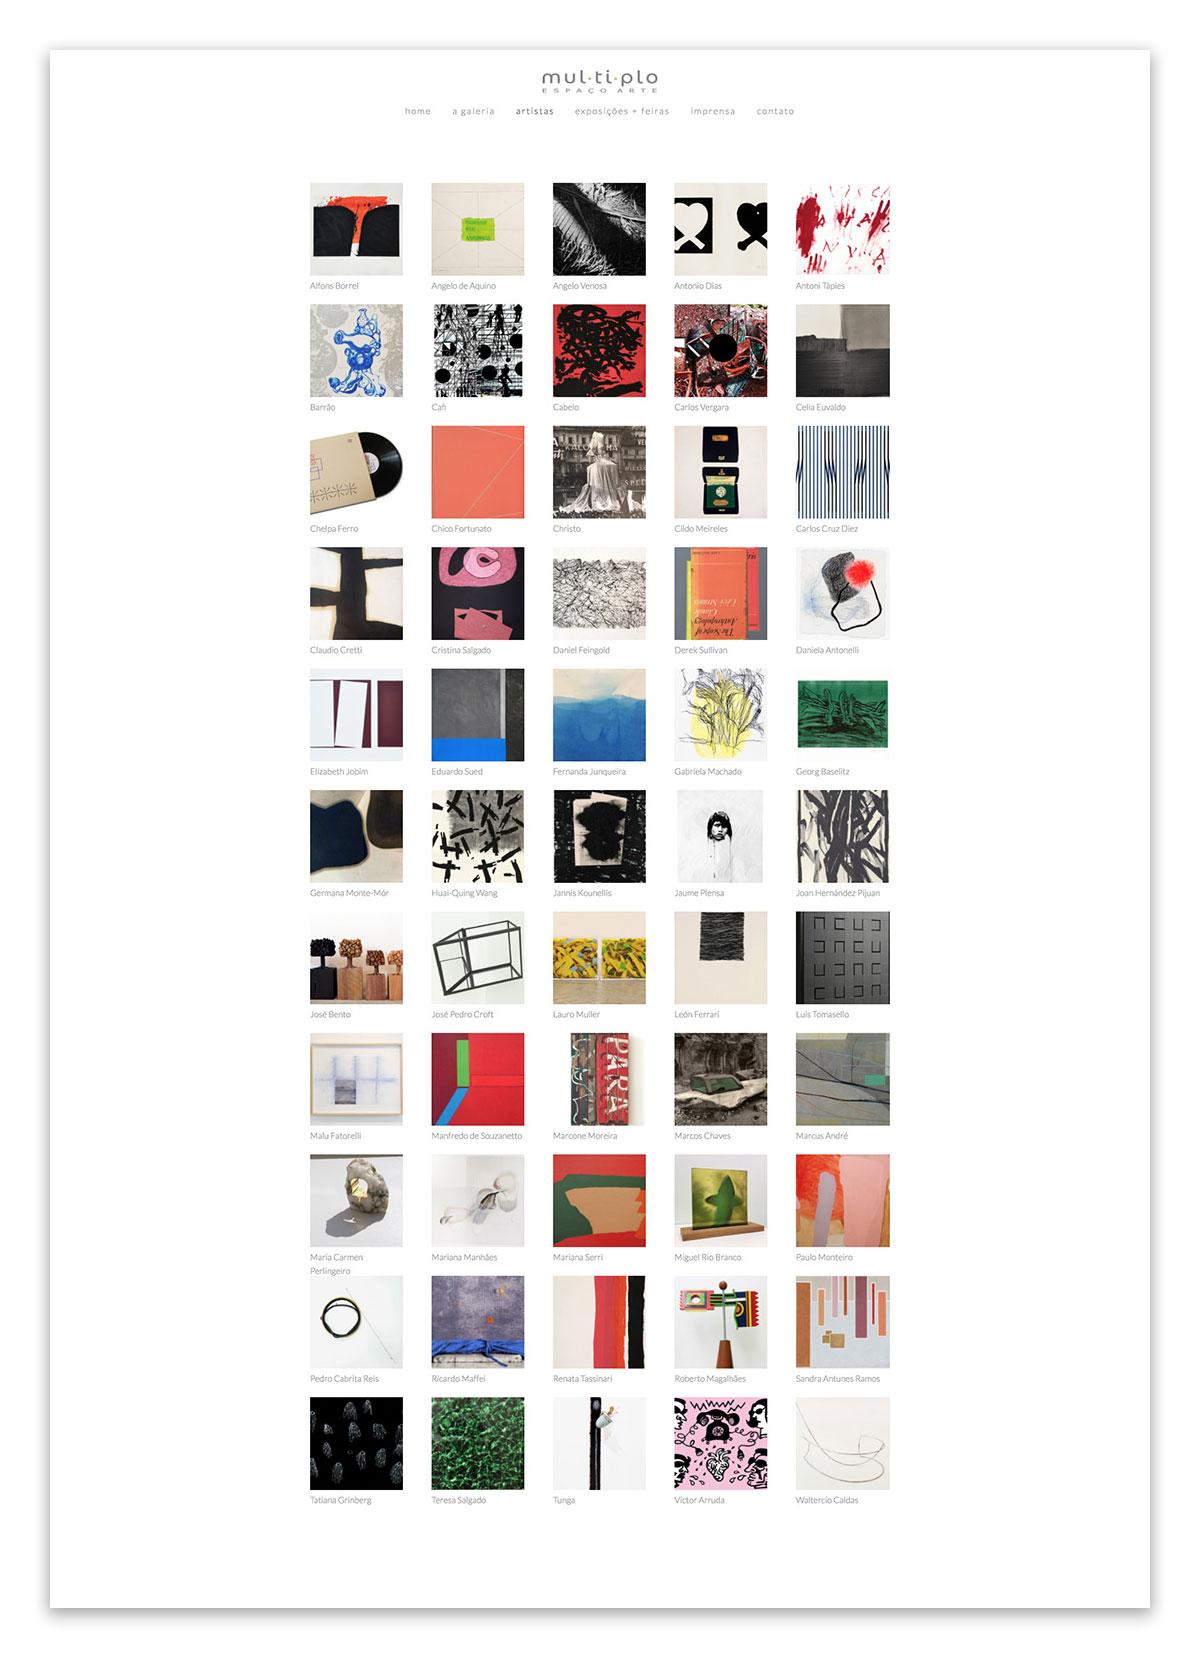 screencapture-multiploespacoarte-br-artistas-1518588629969.jpg